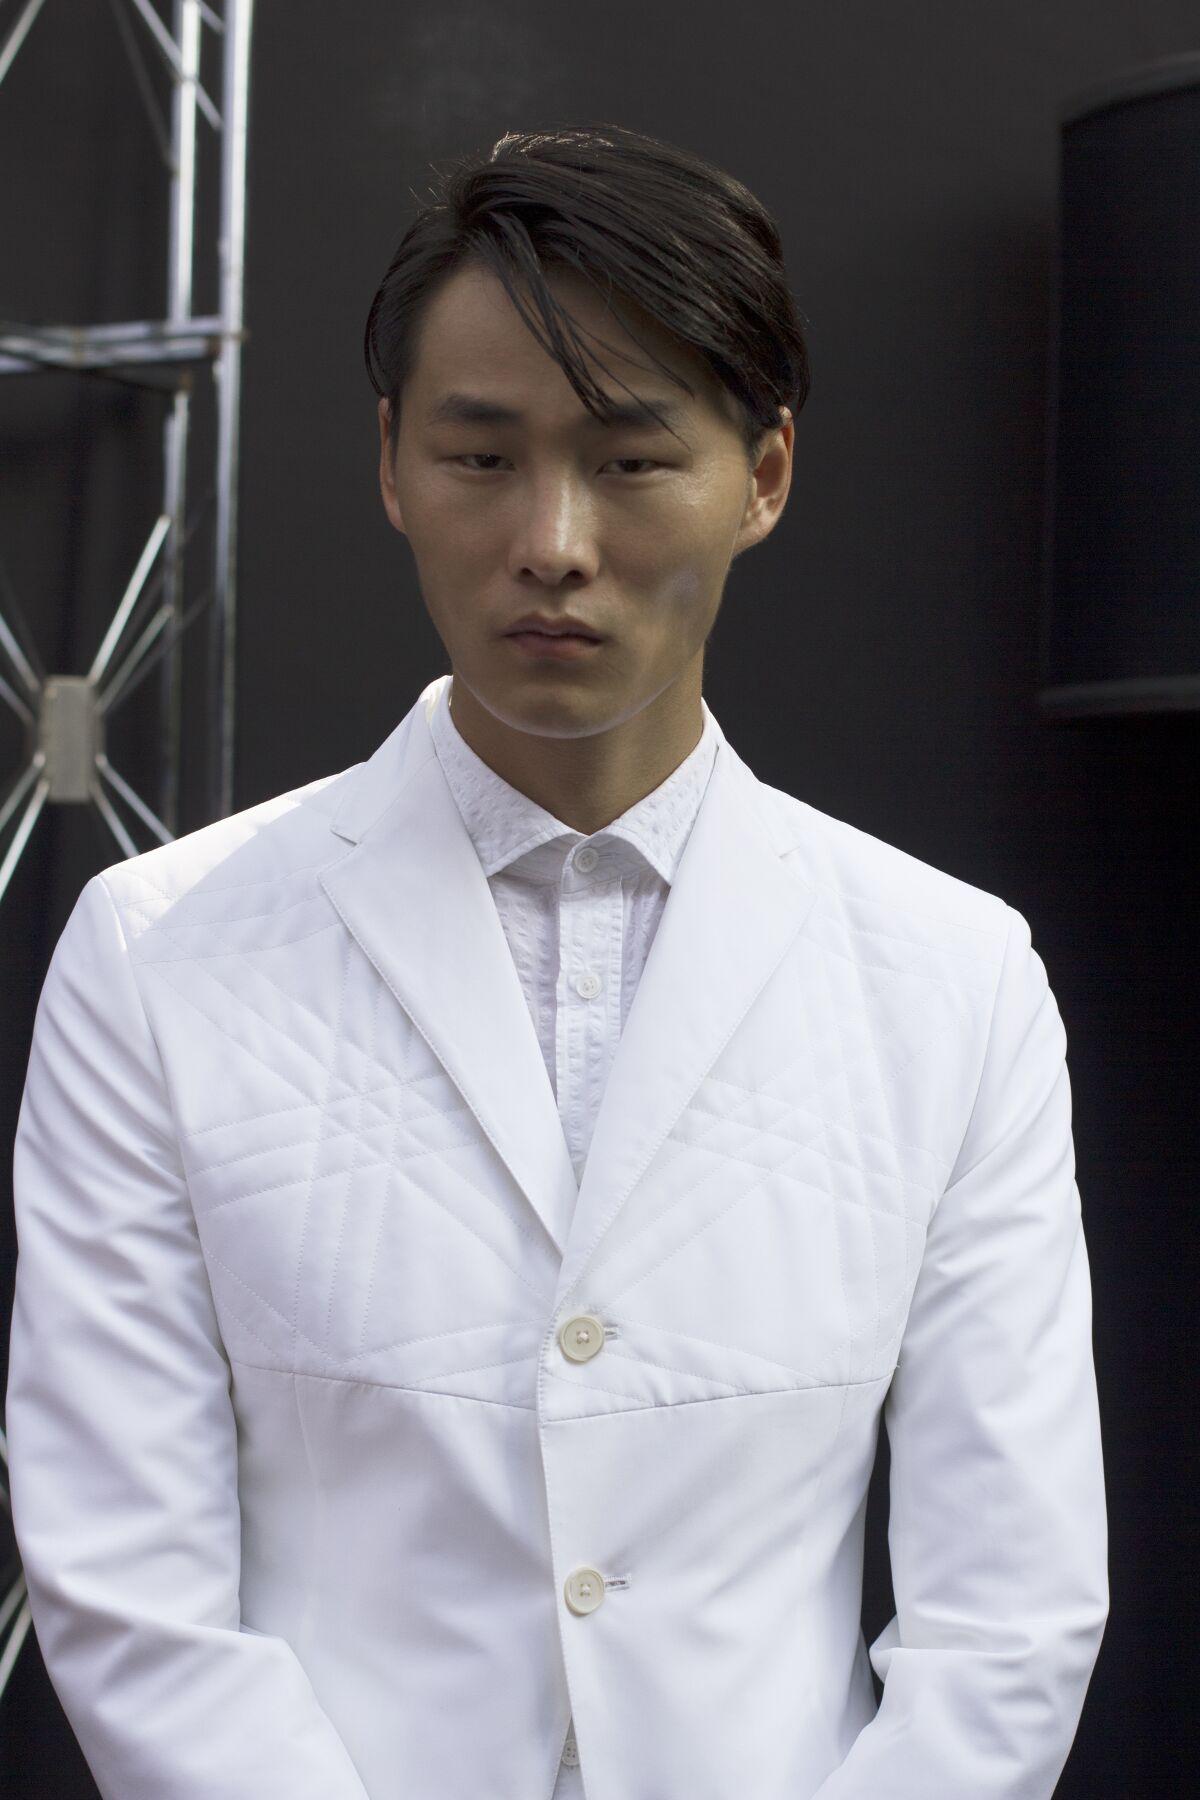 Backstage Fashion Man Model